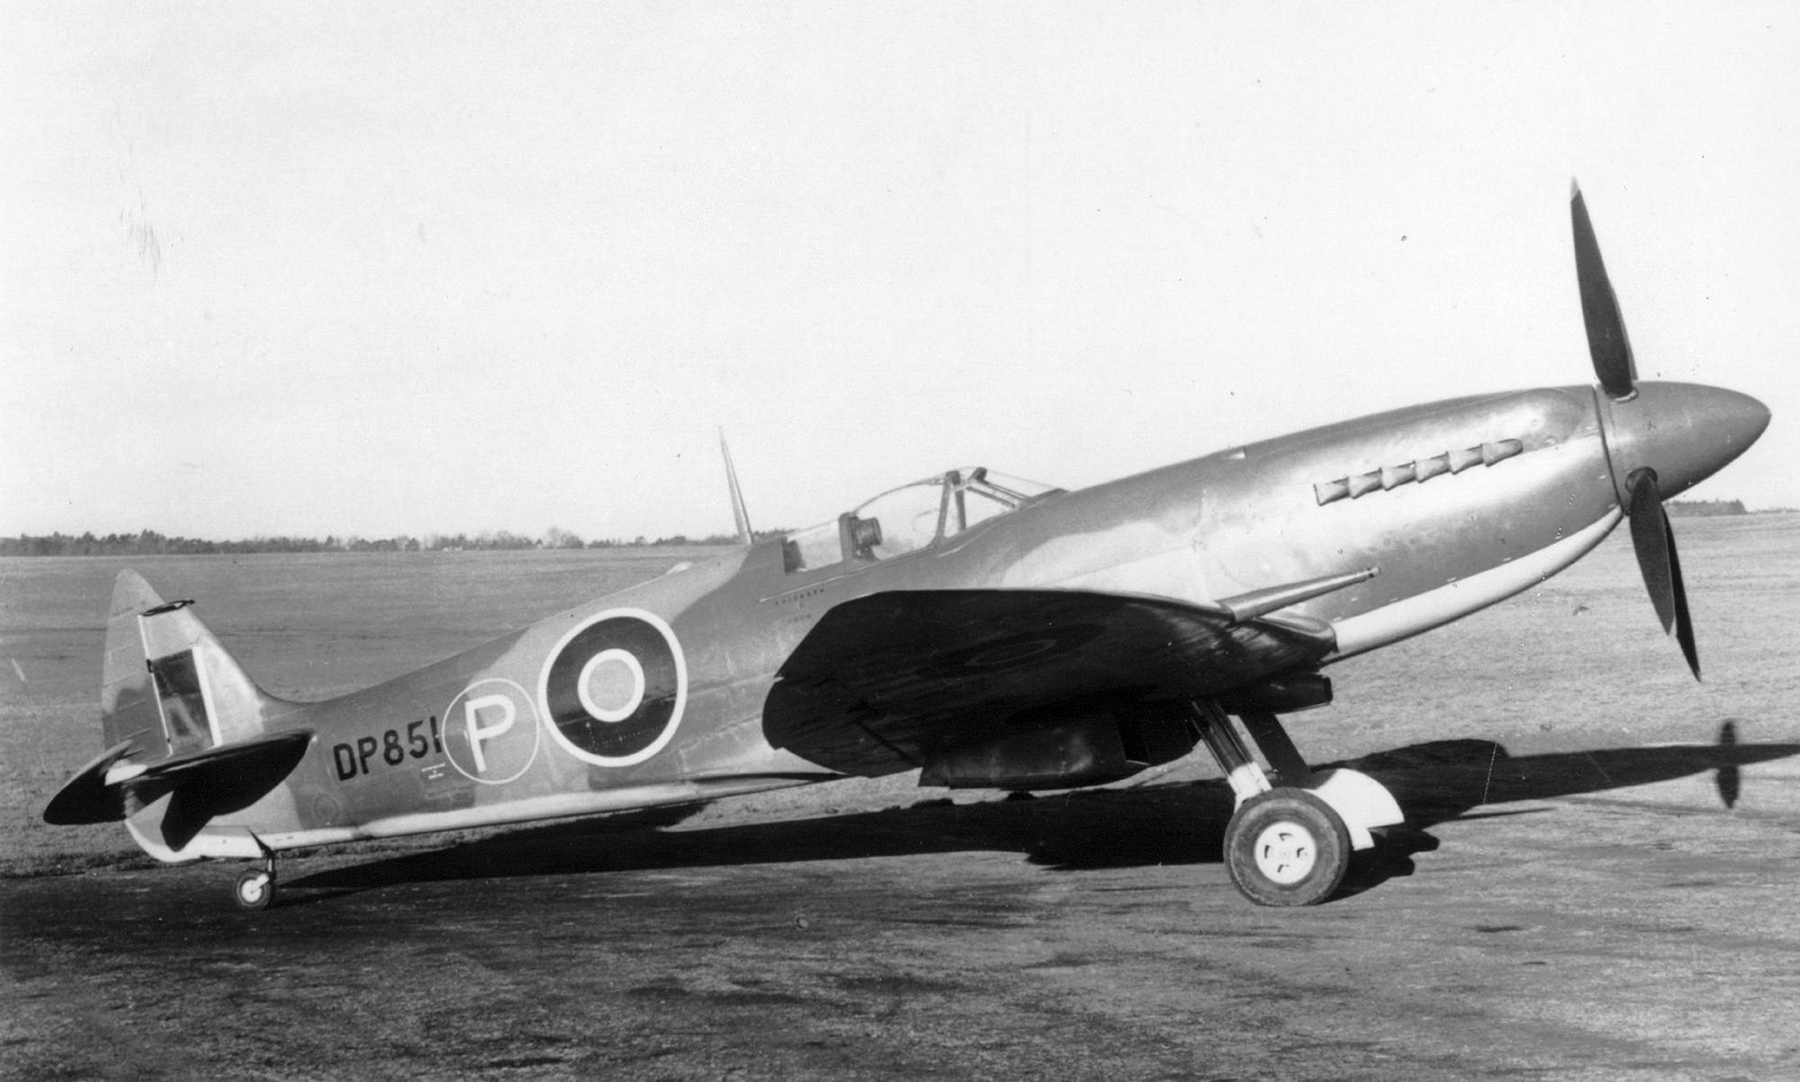 Spitfire 4 Prototype Mk21 DP851 England 1942 01